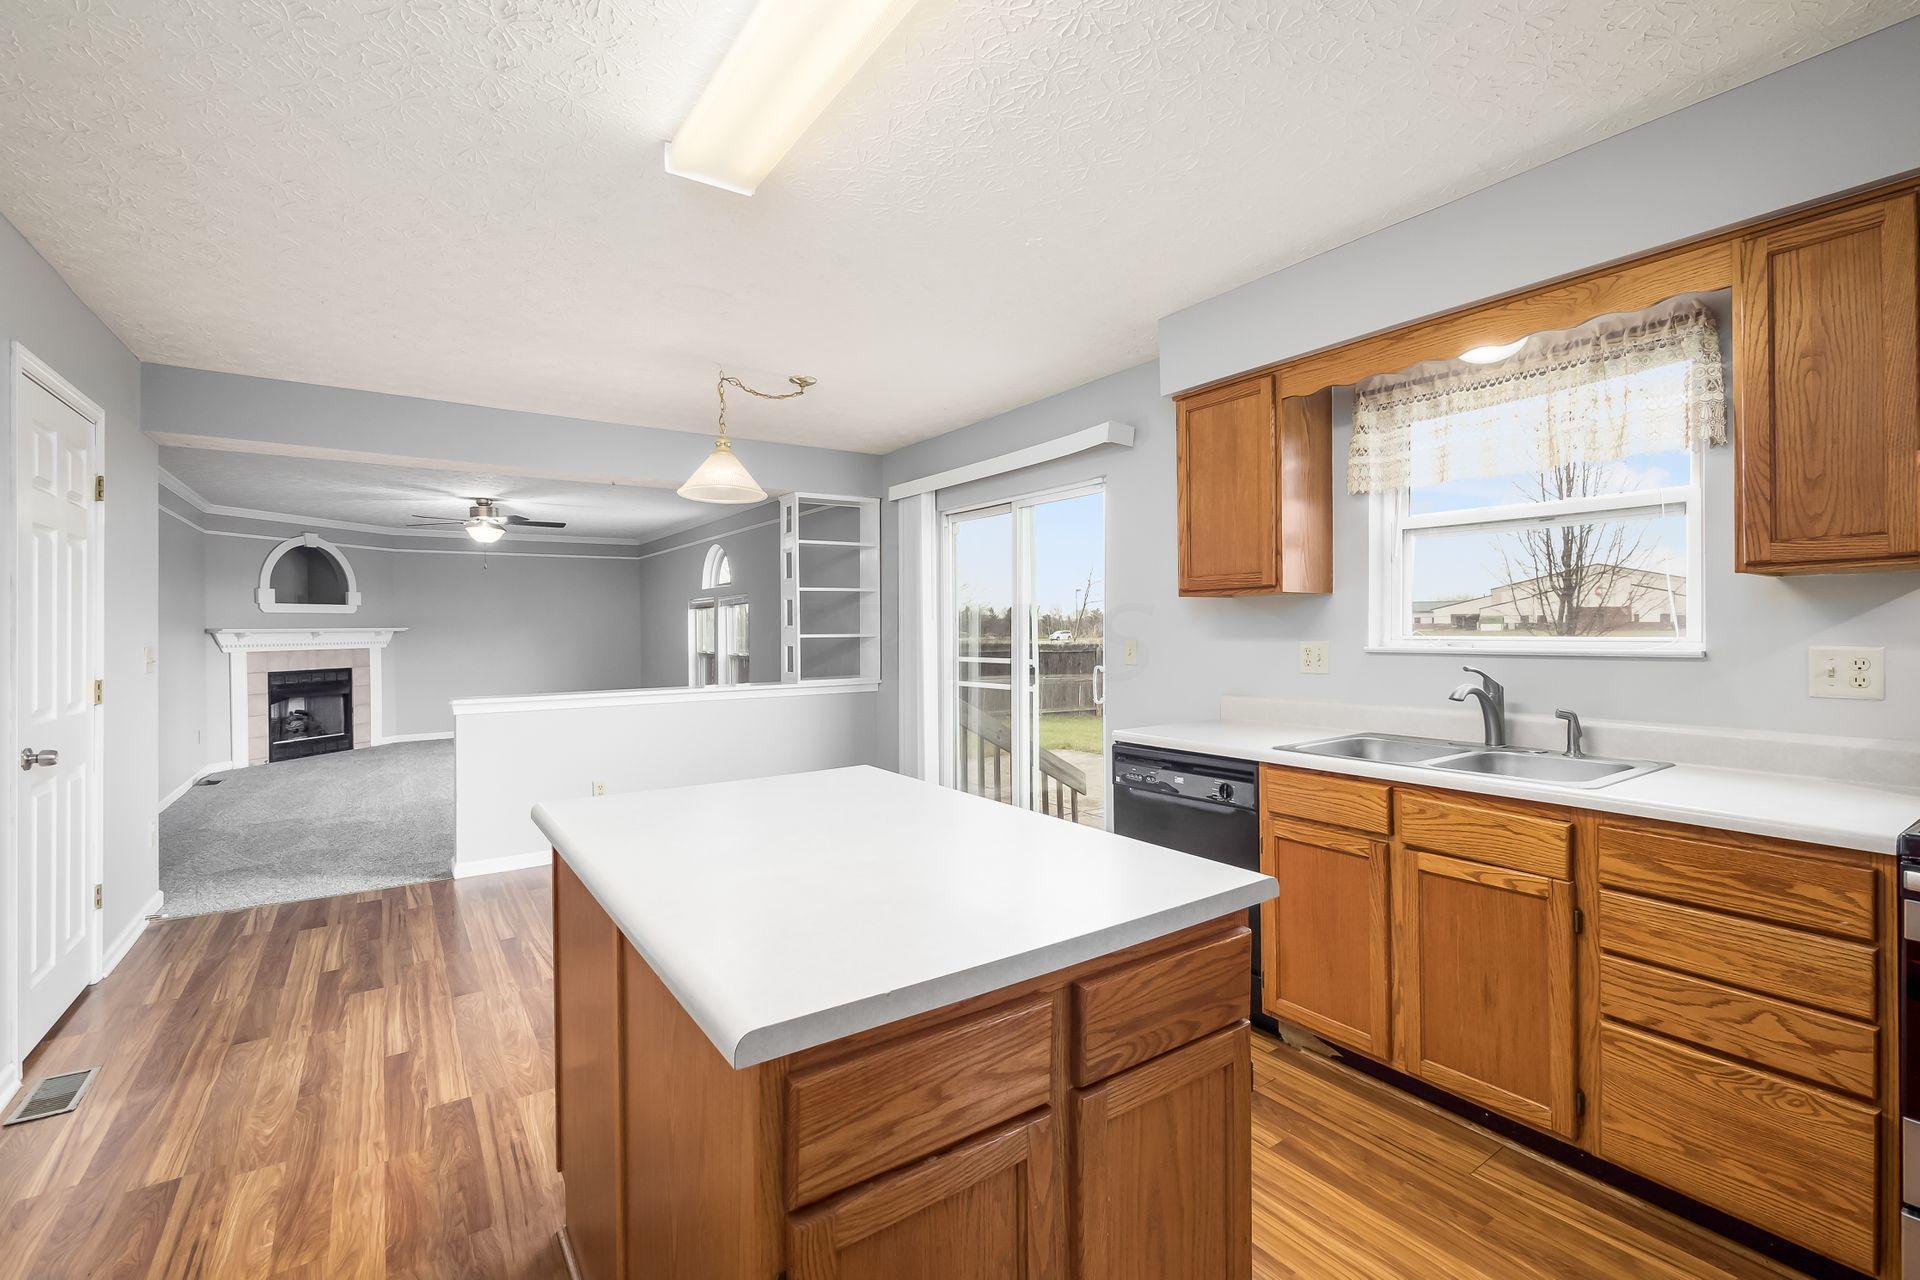 135 Knights Bridge Drive, Pickerington, Ohio 43147, 4 Bedrooms Bedrooms, ,3 BathroomsBathrooms,Residential,For Sale,Knights Bridge,220041140